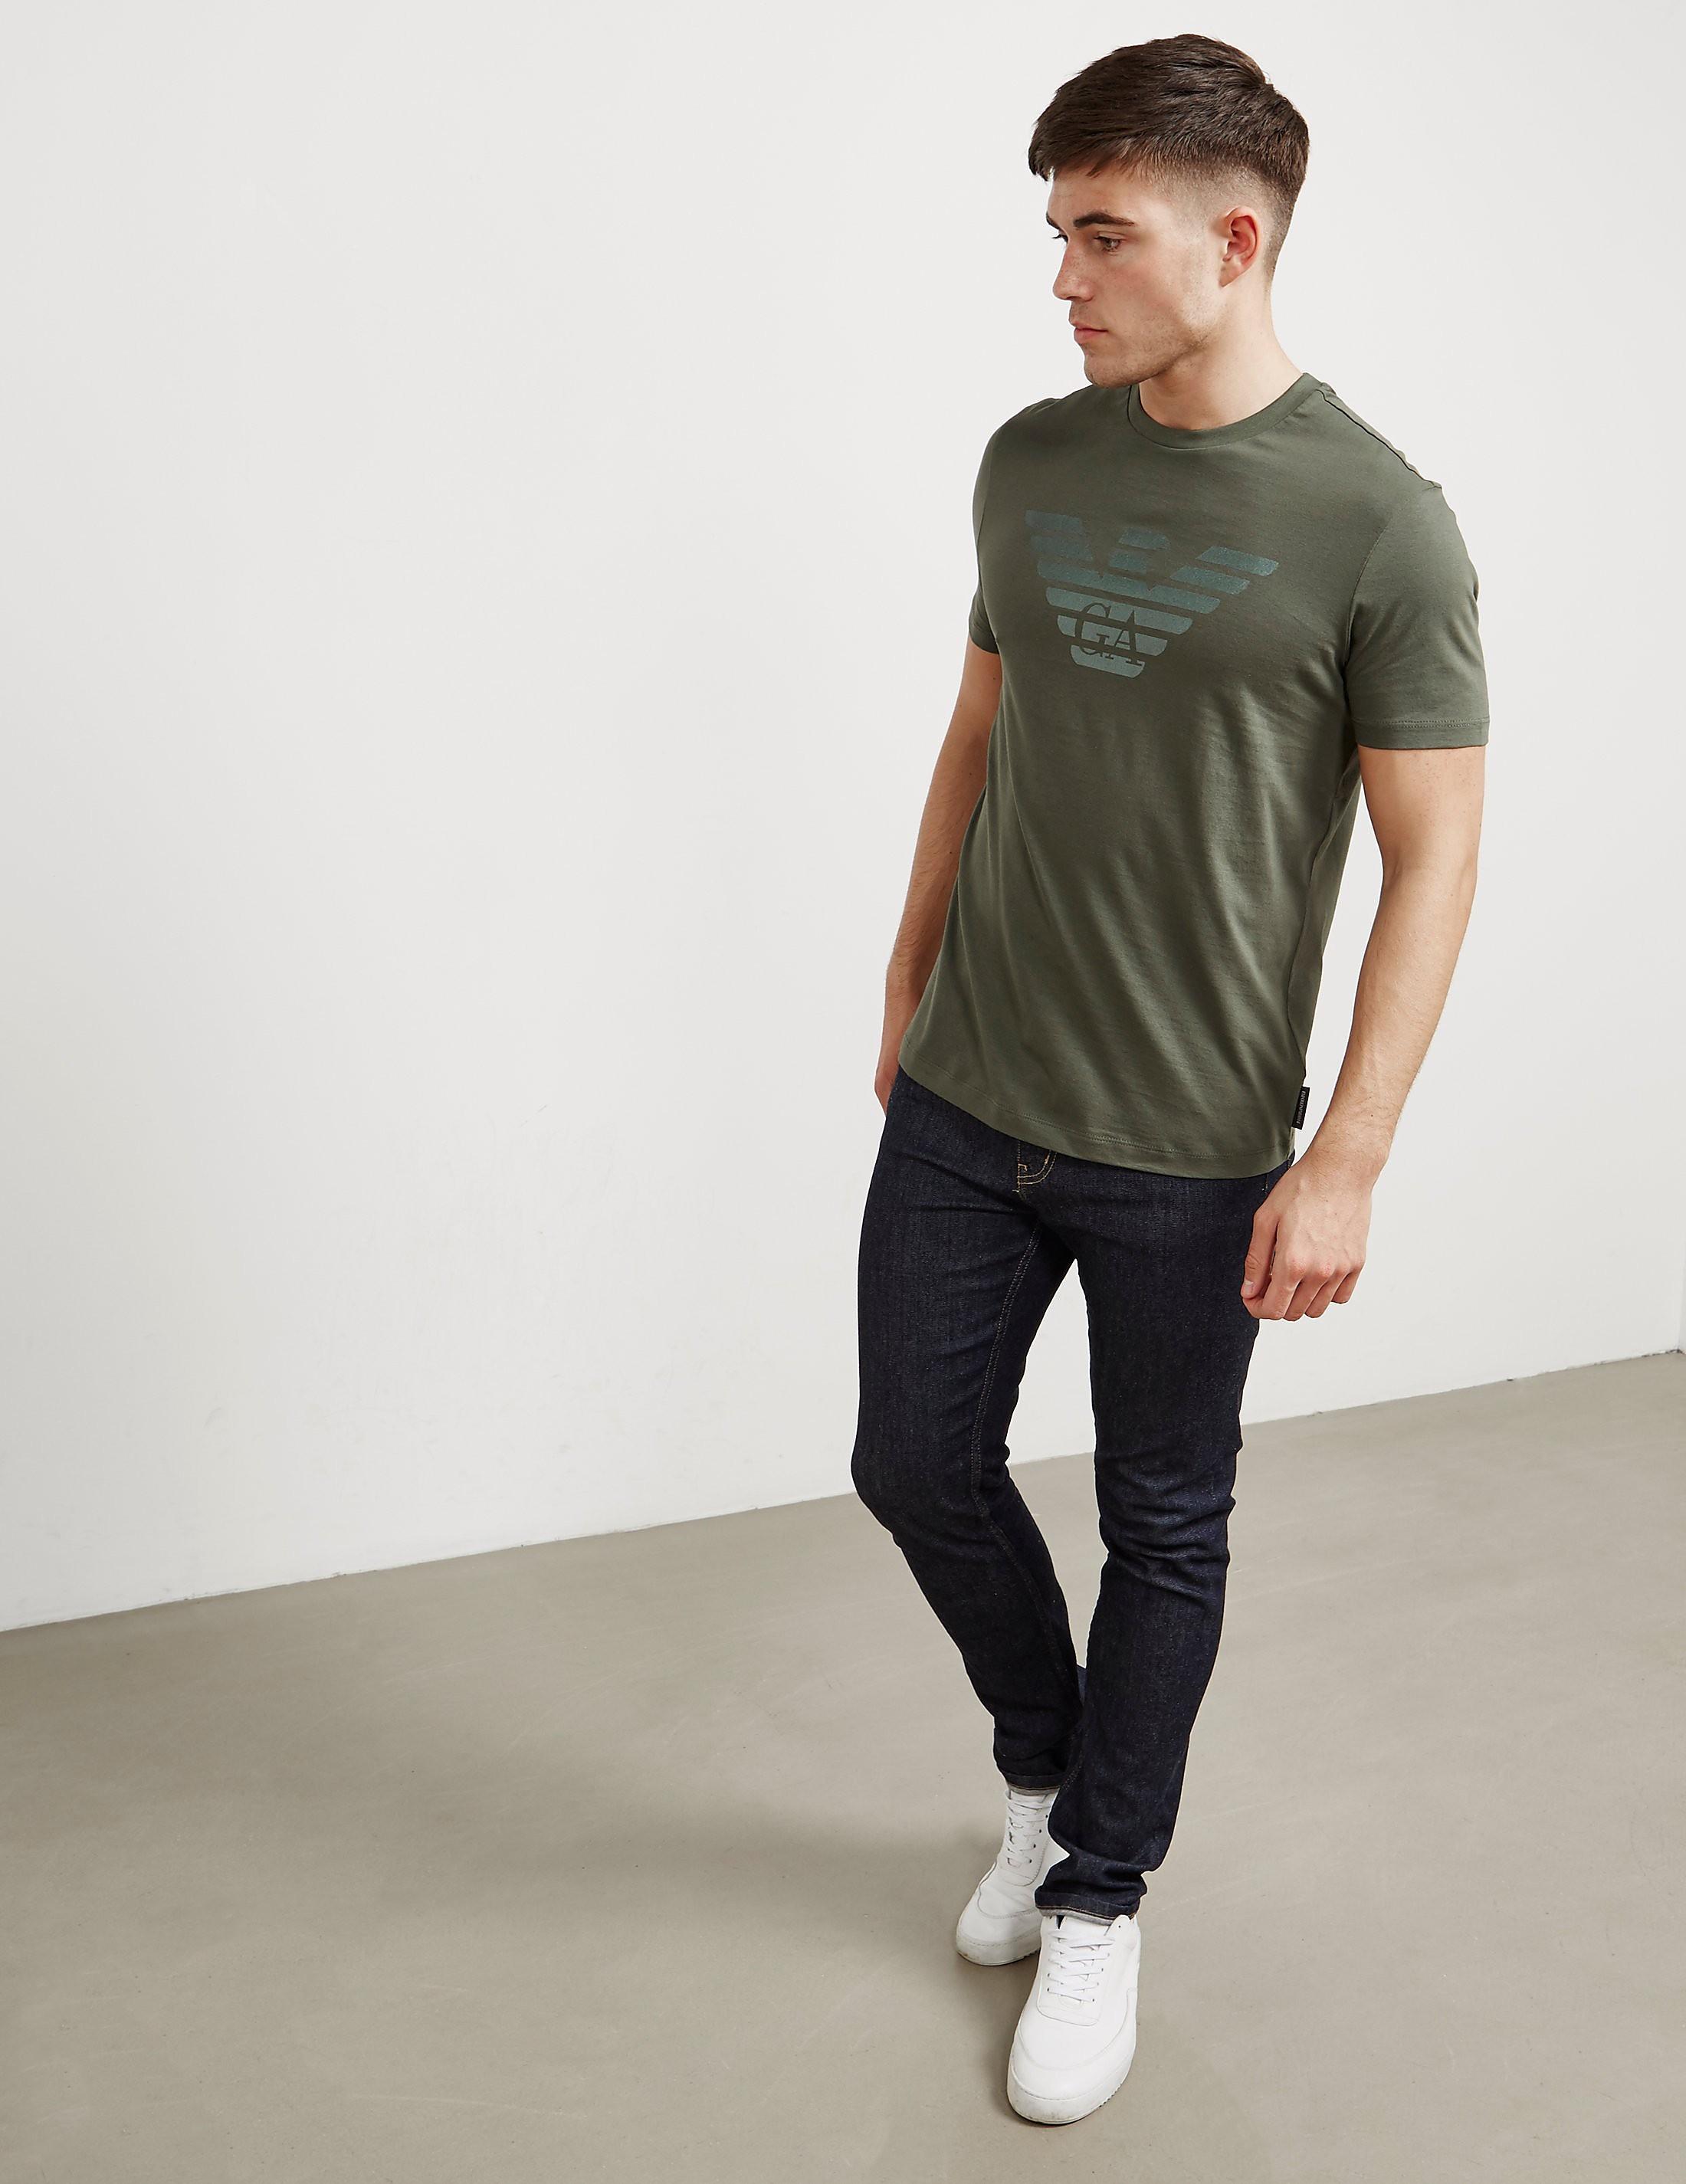 Emporio Armani Double Eagle Short Sleeve T-Shirt